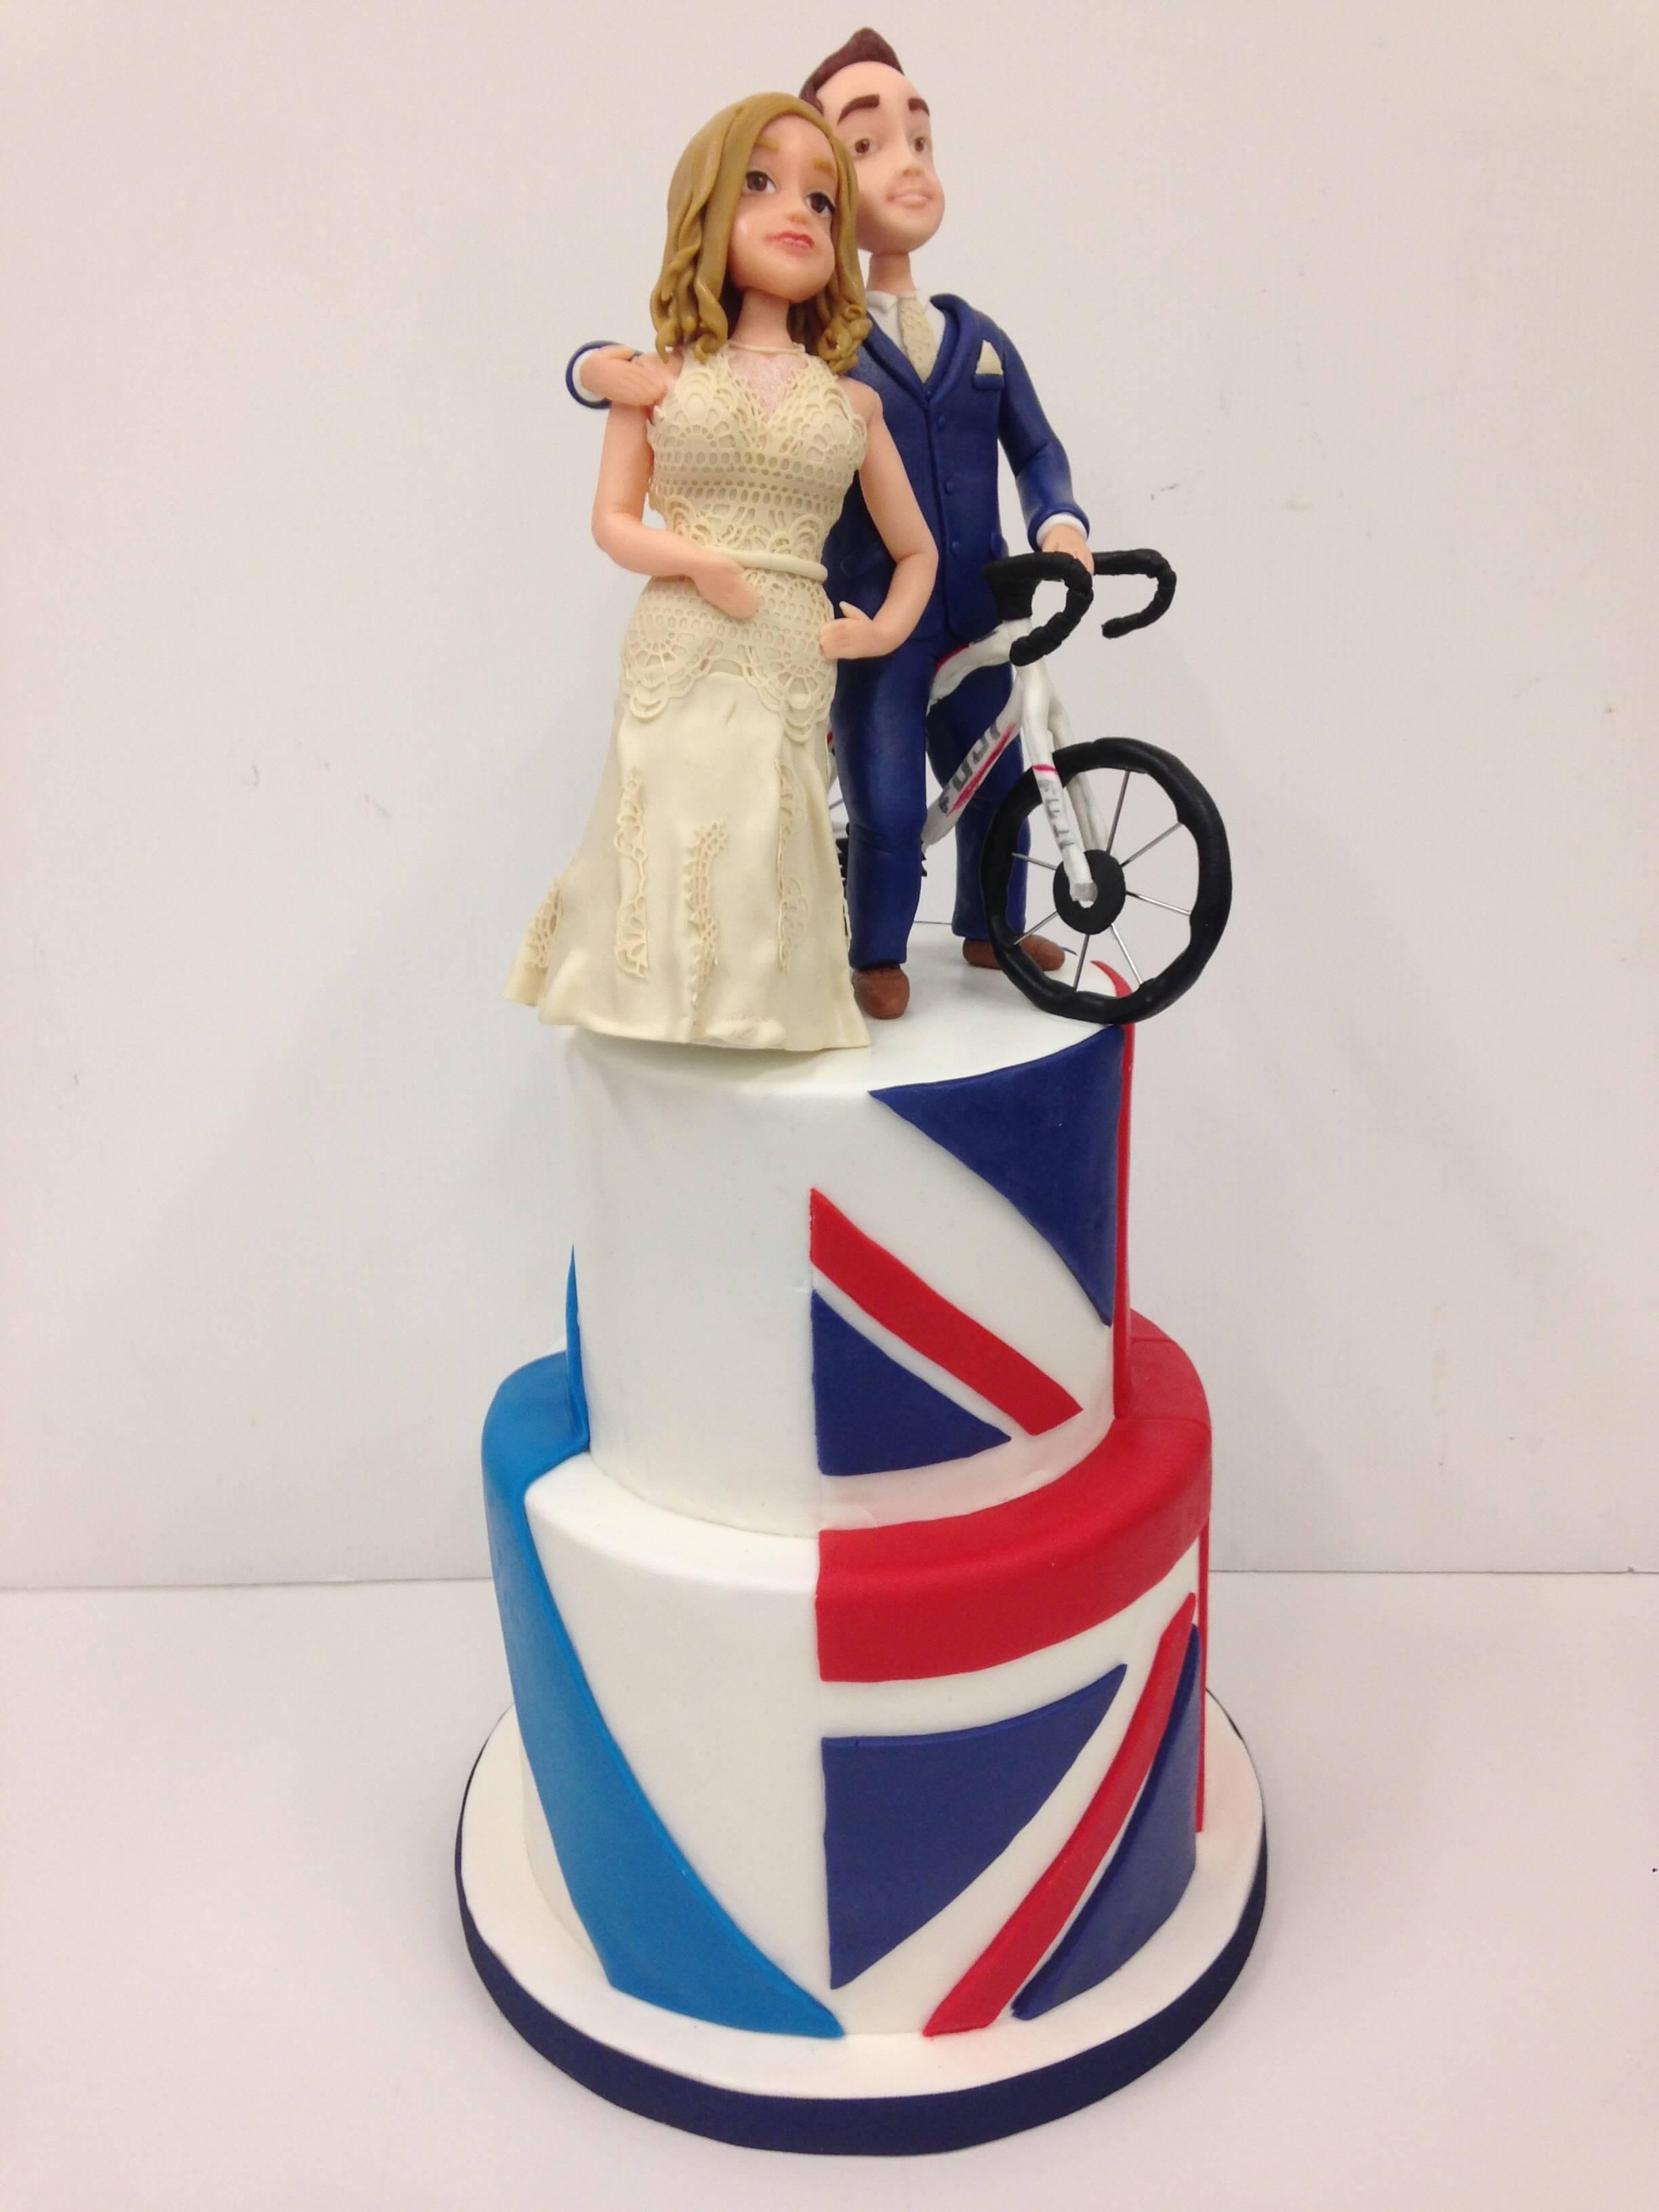 Tarta personalizada boda coruña fondant inglaetra galicia bici decorada coruña pastelería